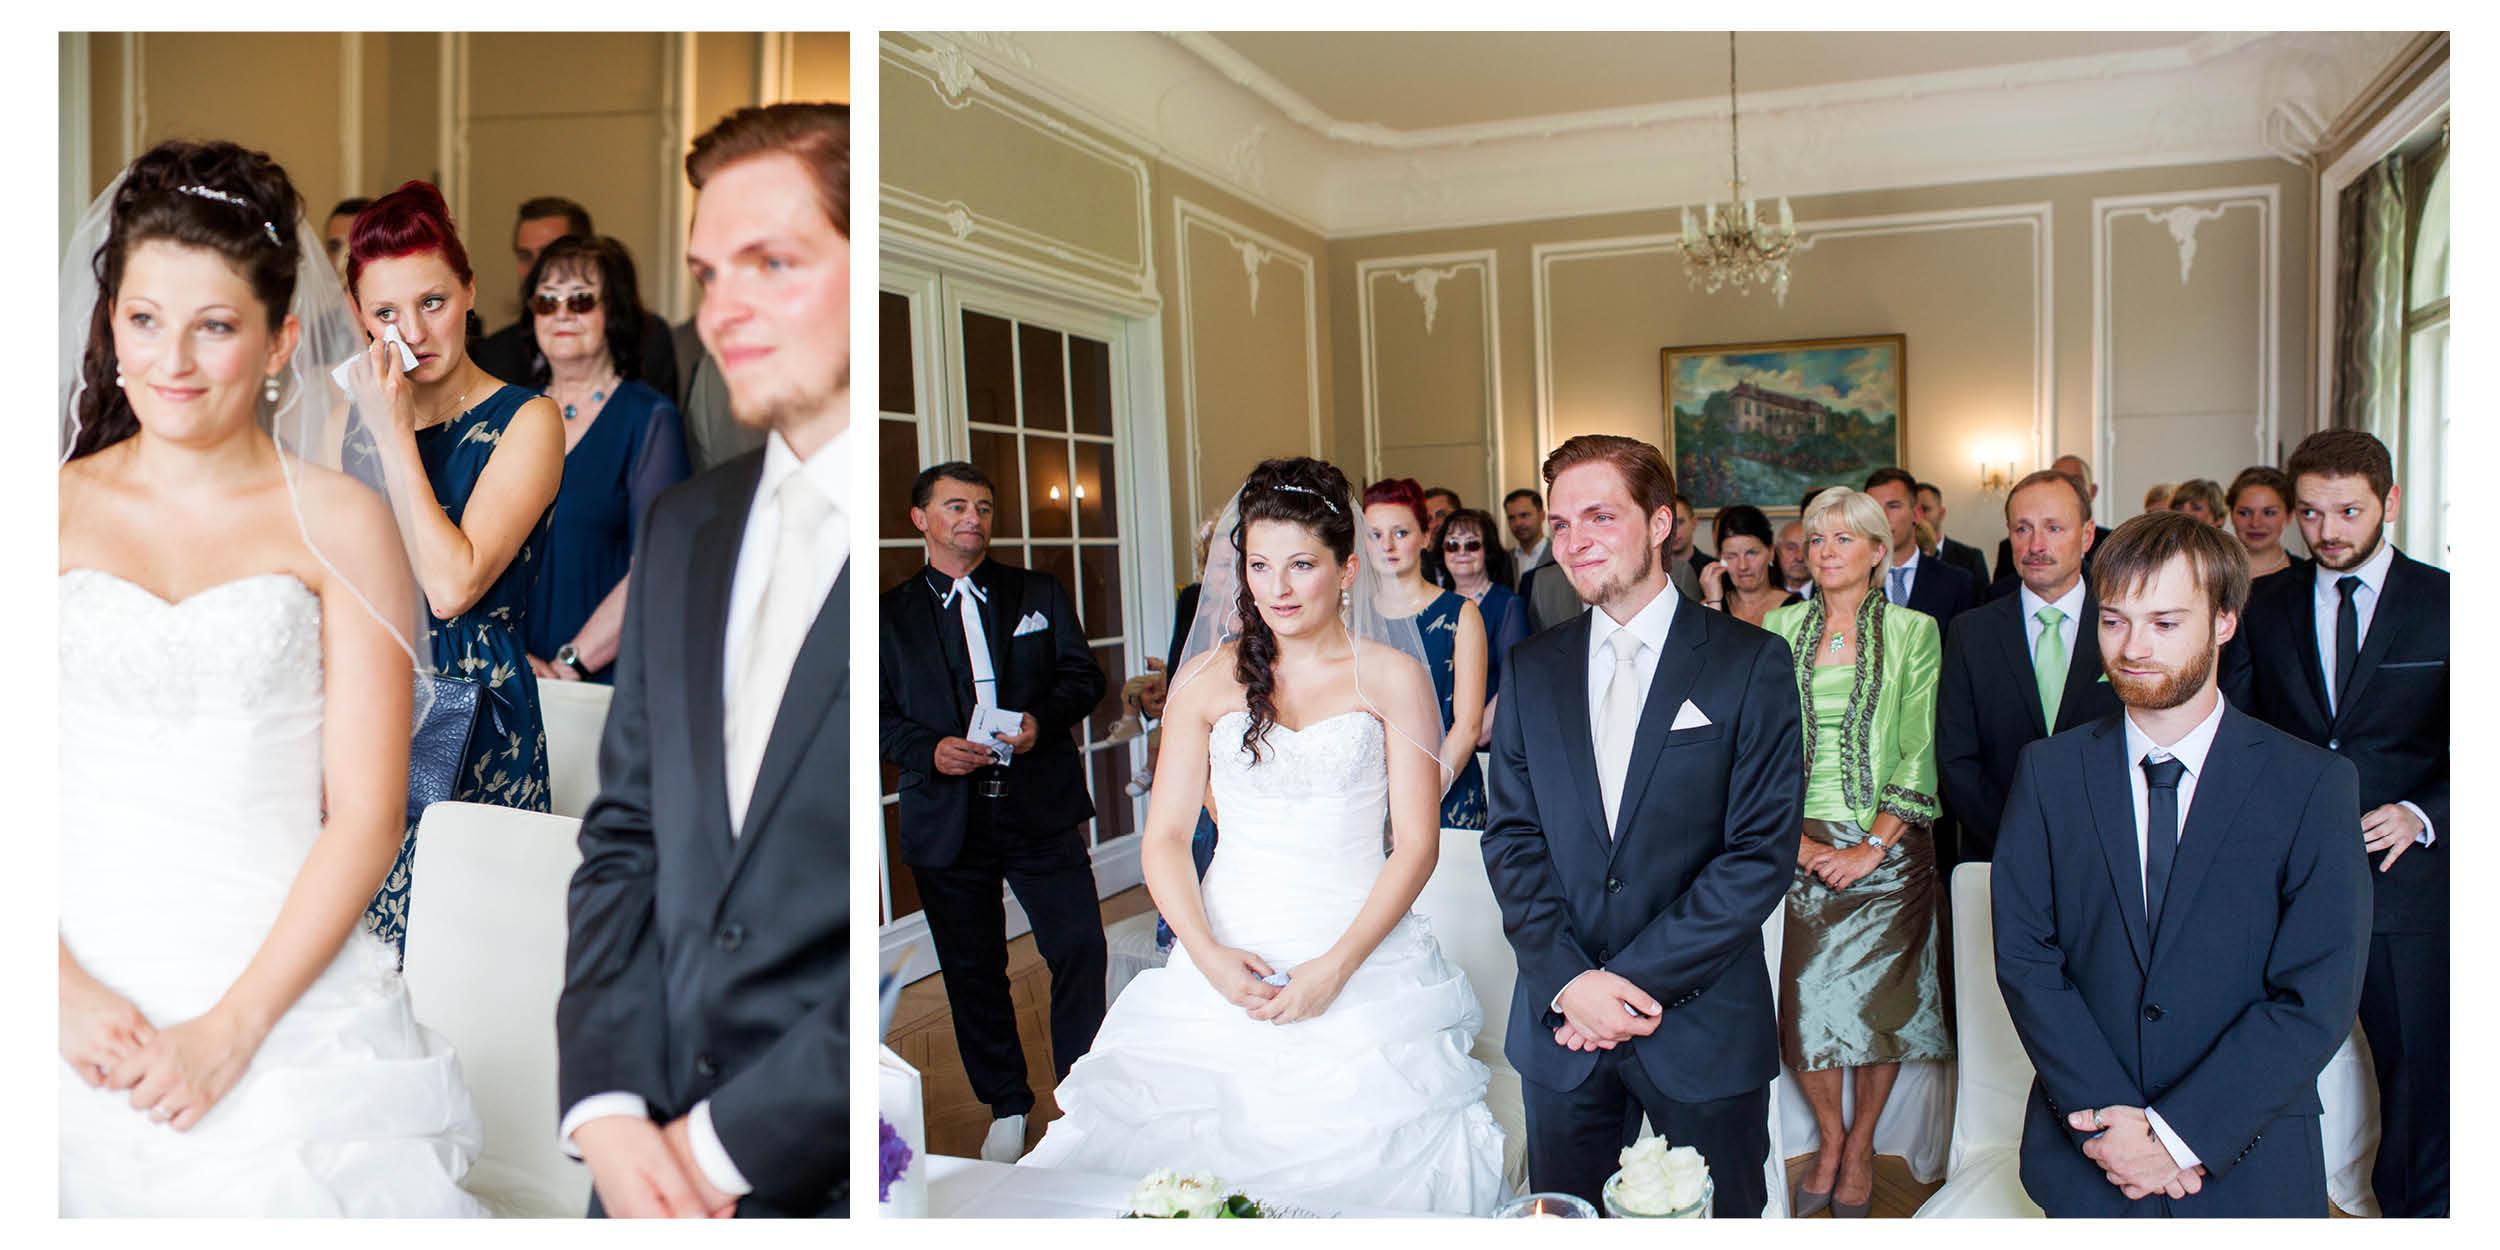 Hochzeit Pösnek 6